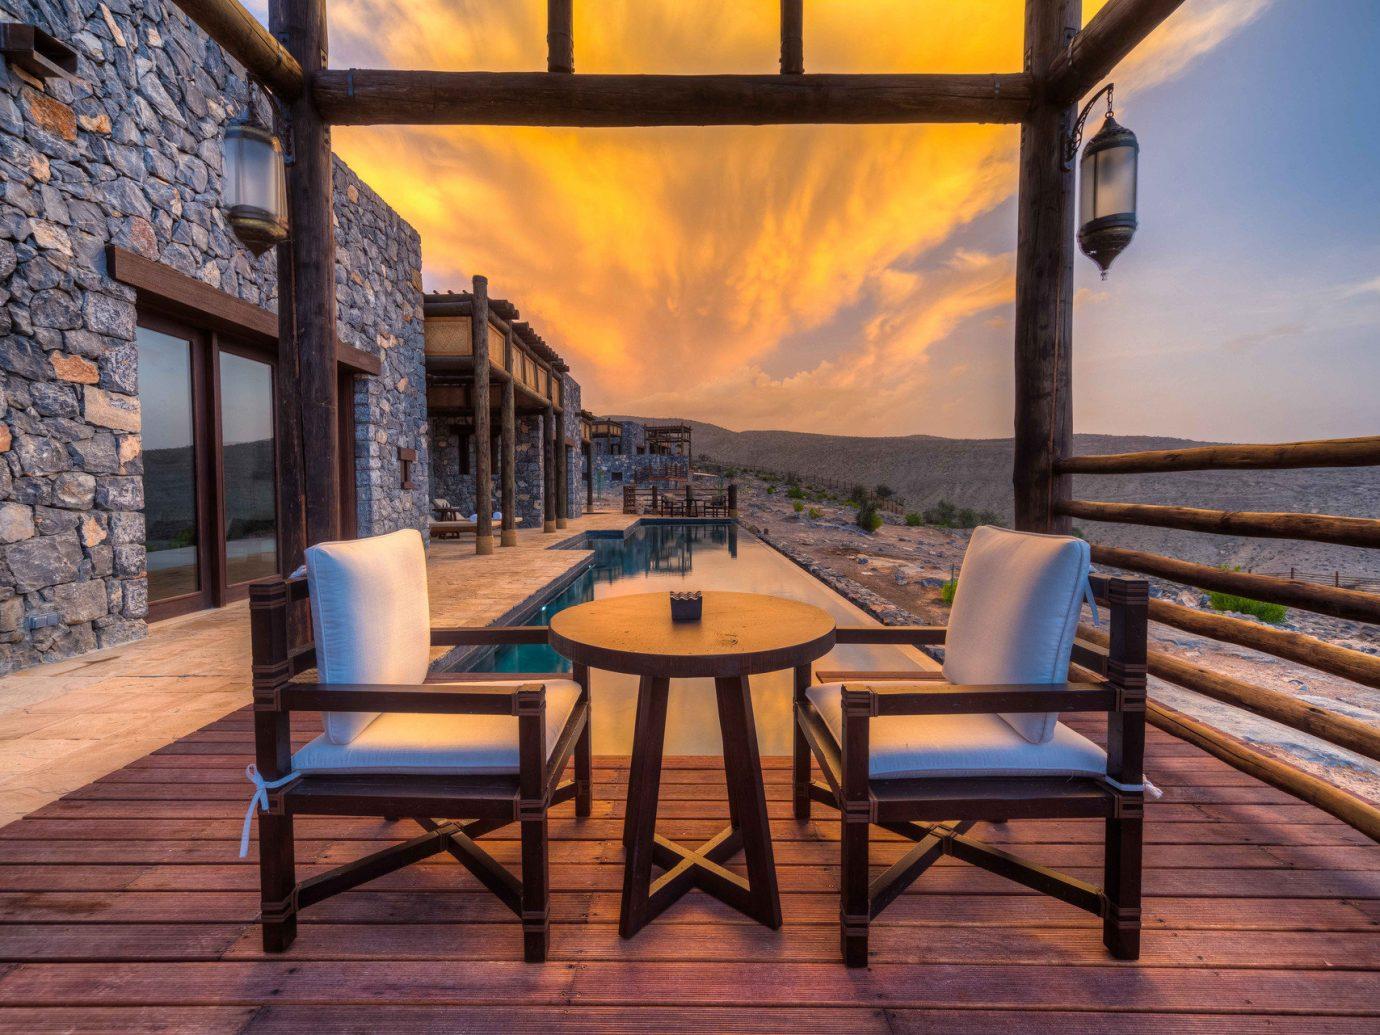 Travel Tips floor room estate Resort wood restaurant interior design evening cottage